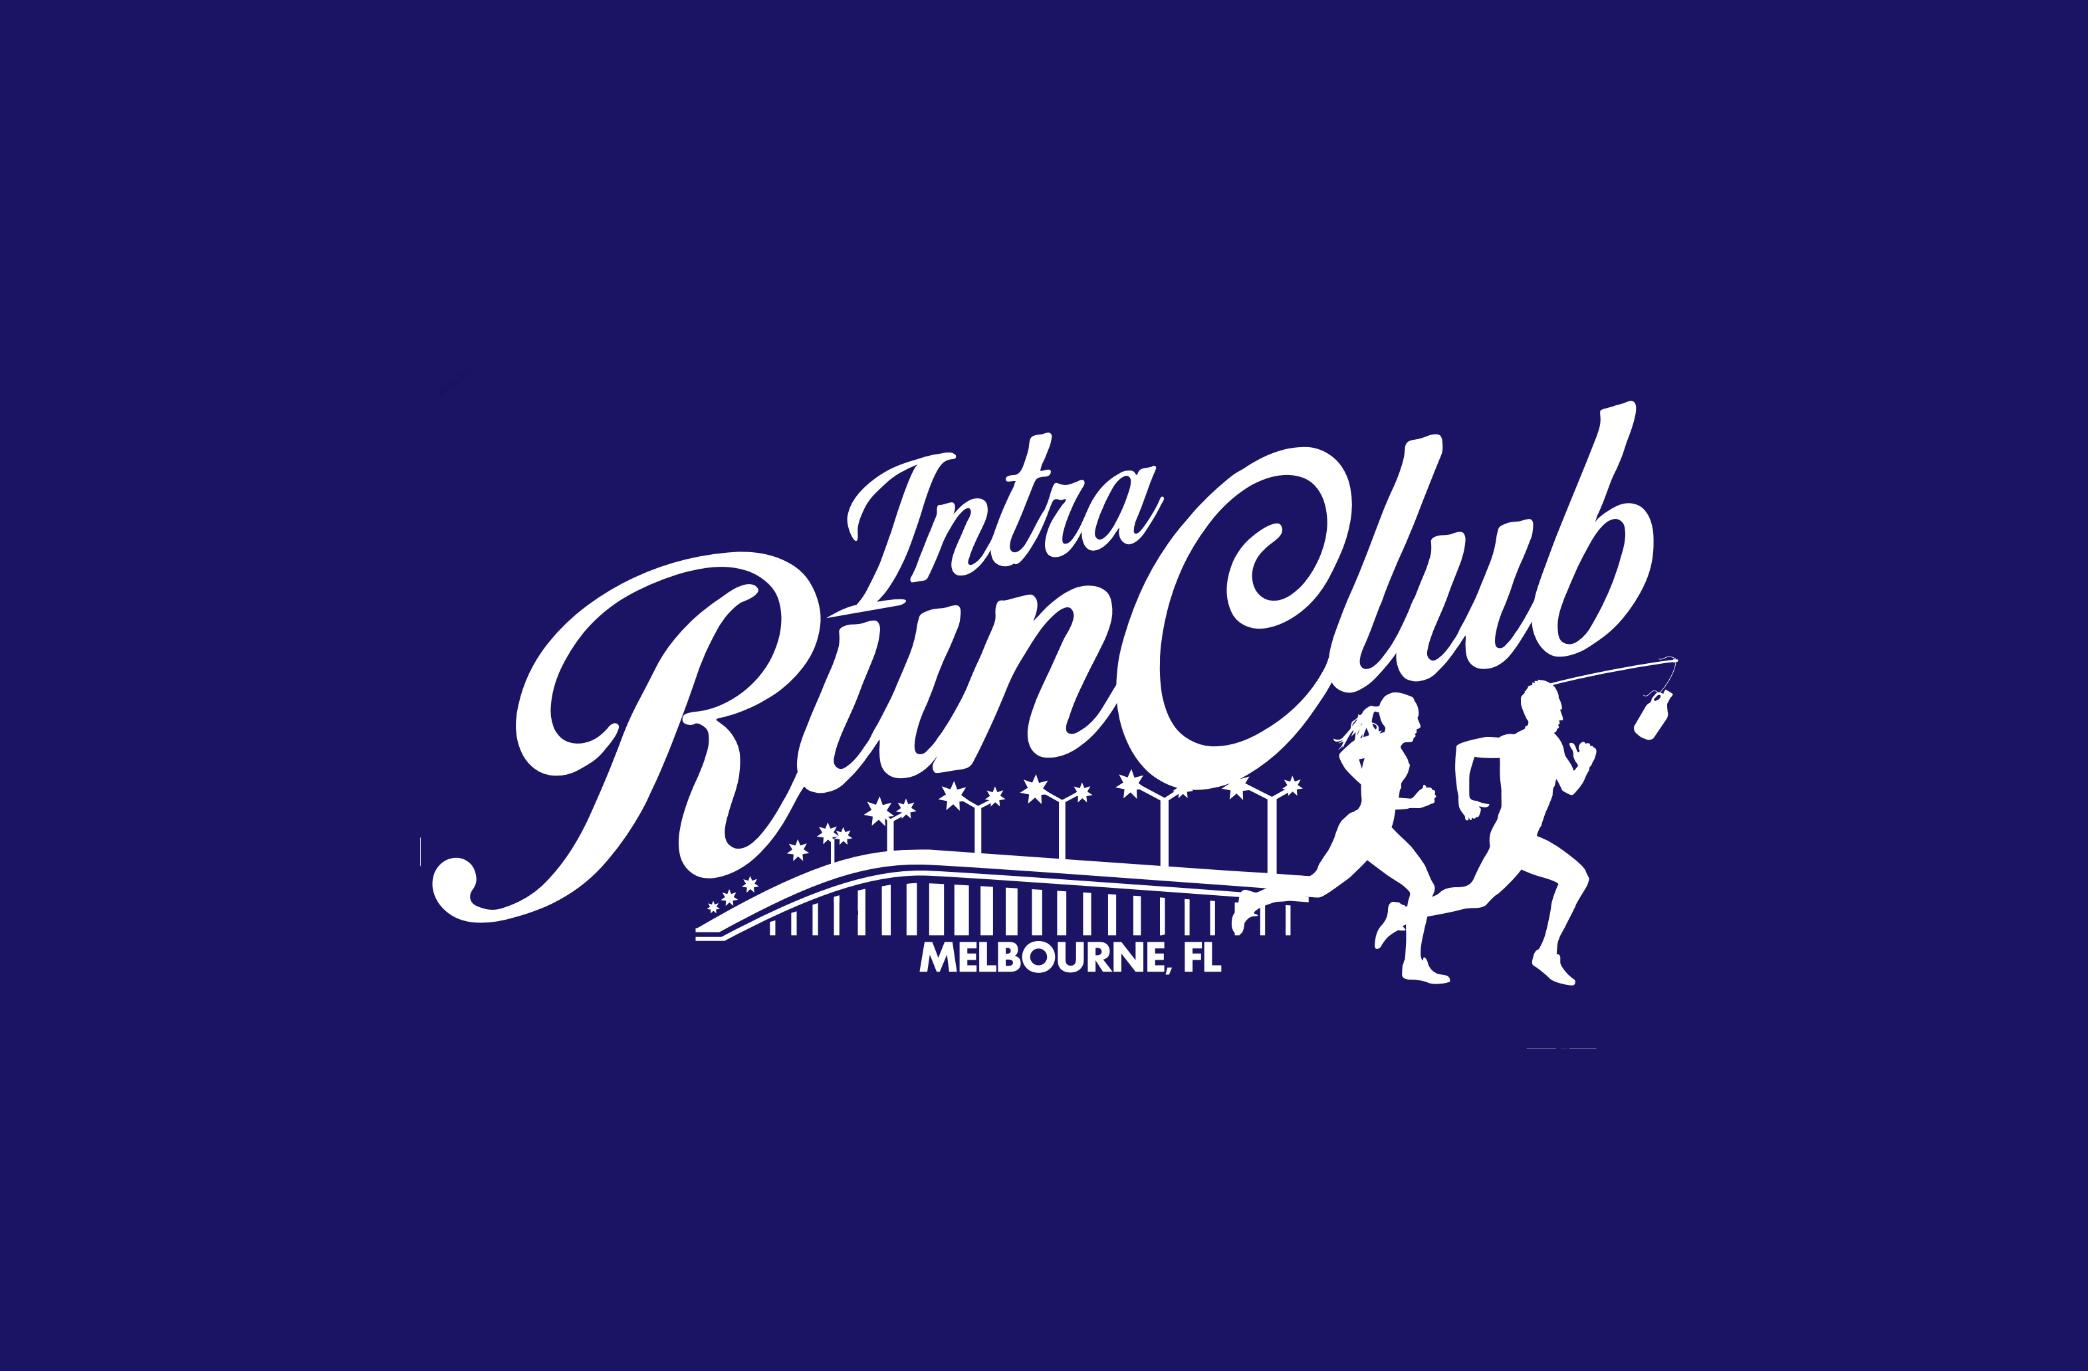 Intra Run Club- 3 Mile Run starting at Intracoastal Brewing Company Wednesdays 5:30pm